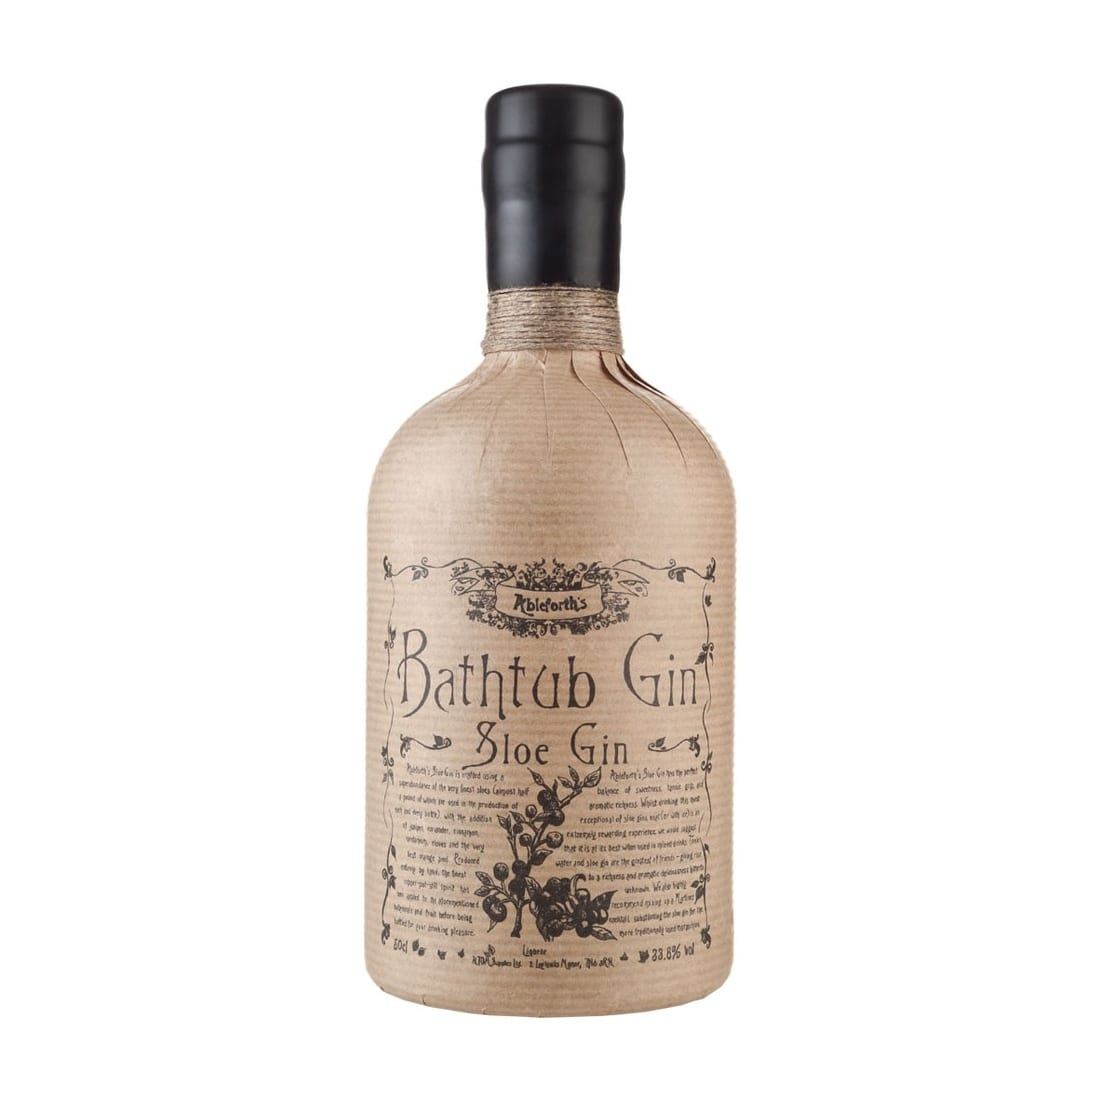 Bathtub Gin – Sloe Gin